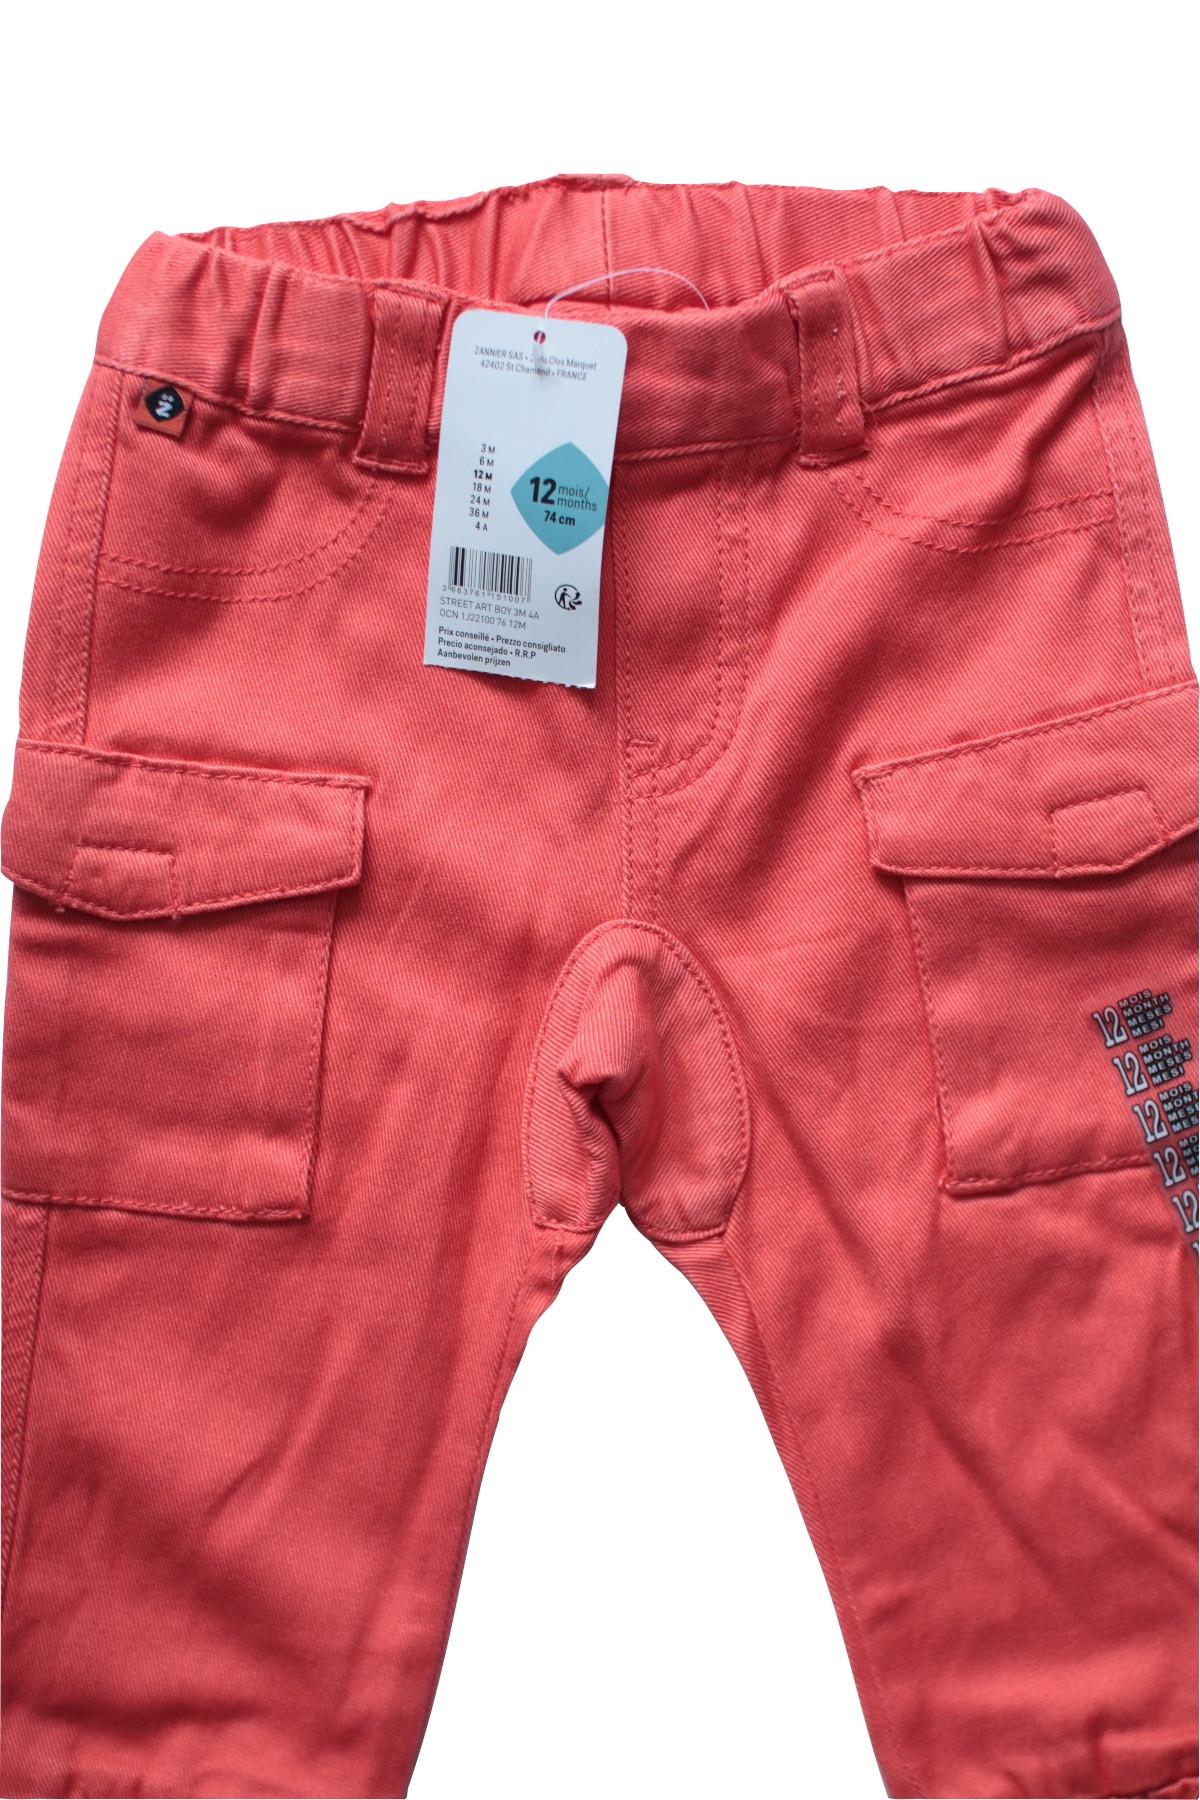 Z Generation baby pants 12M - 1